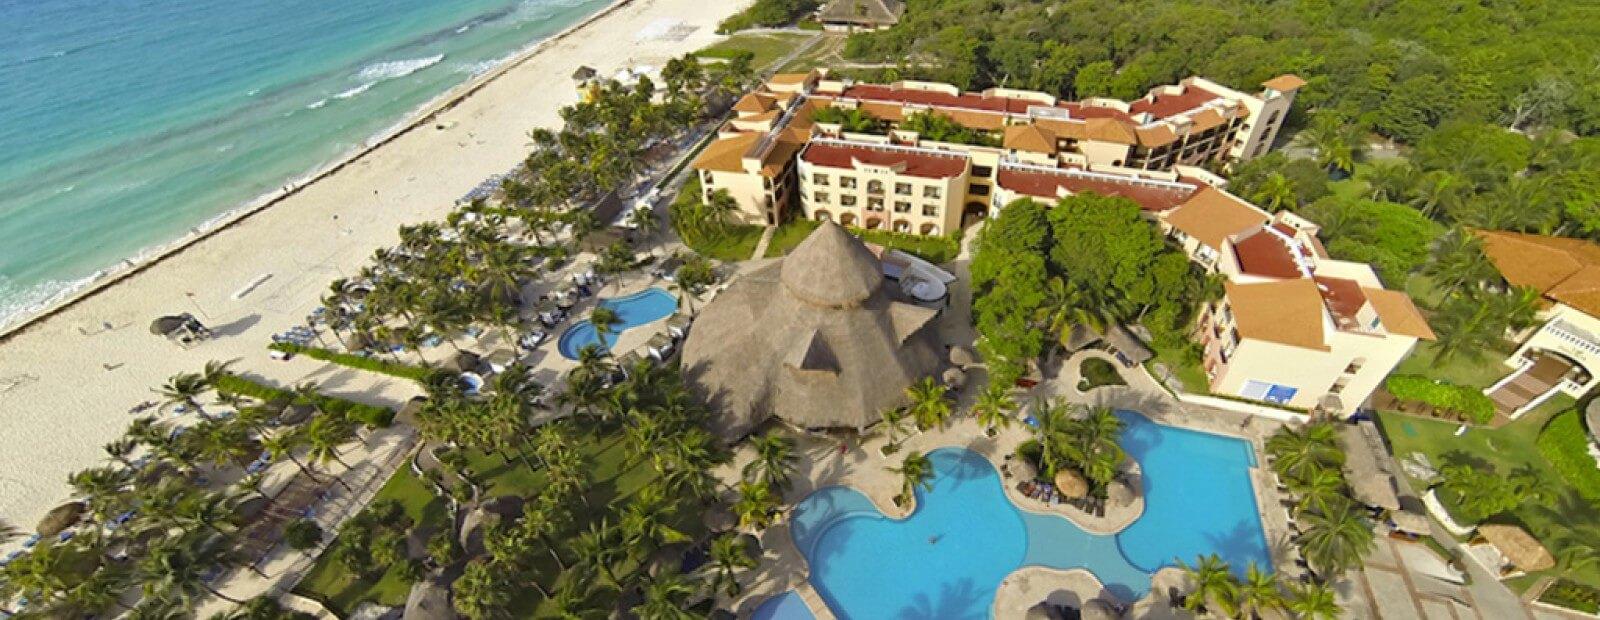 Vacation Deals Playacar